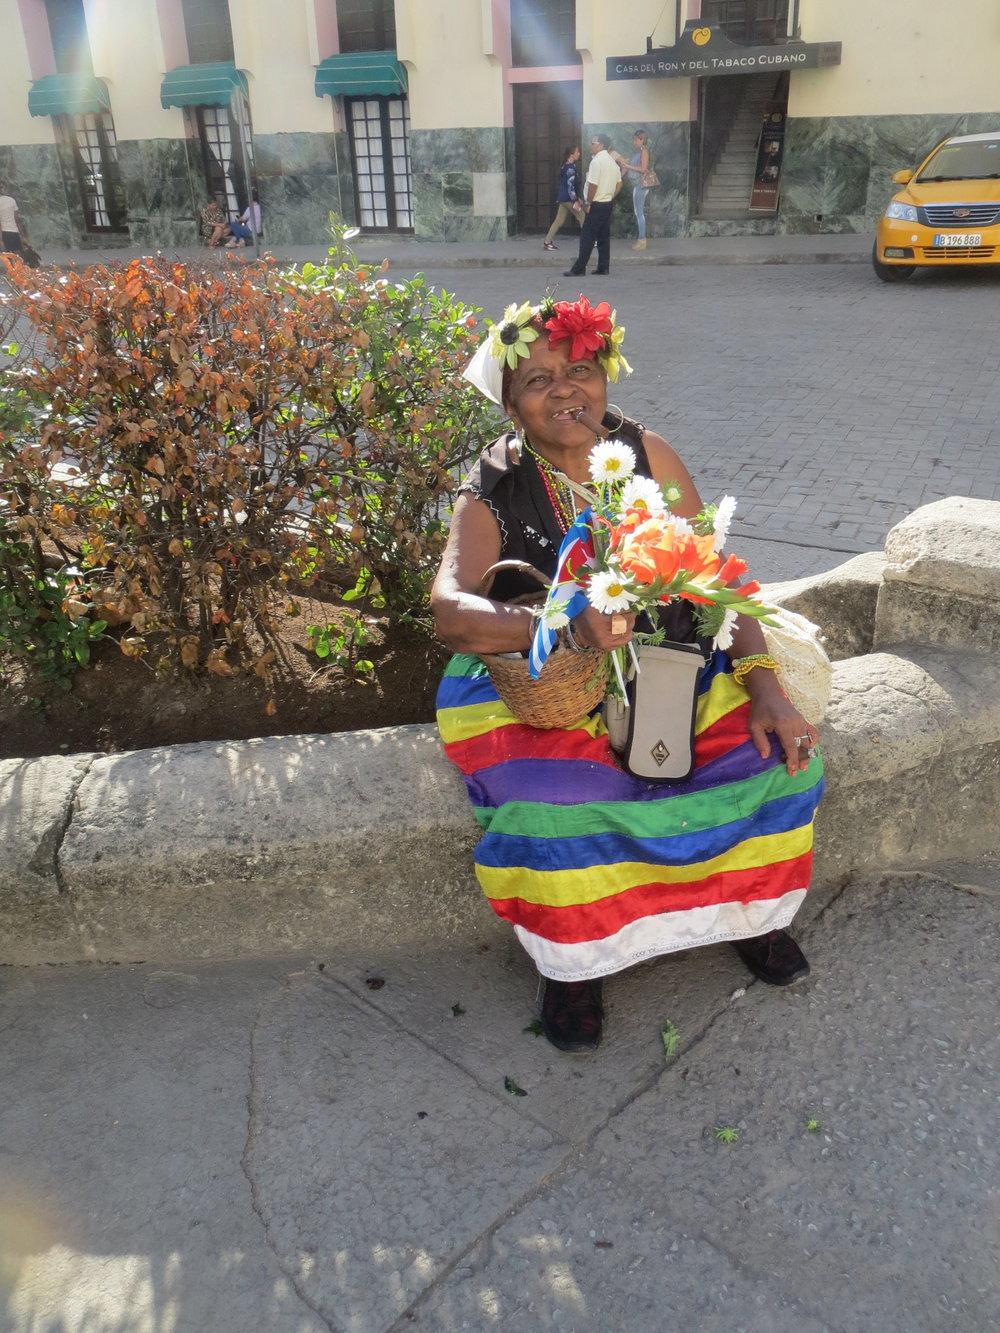 CubaCigarWoman